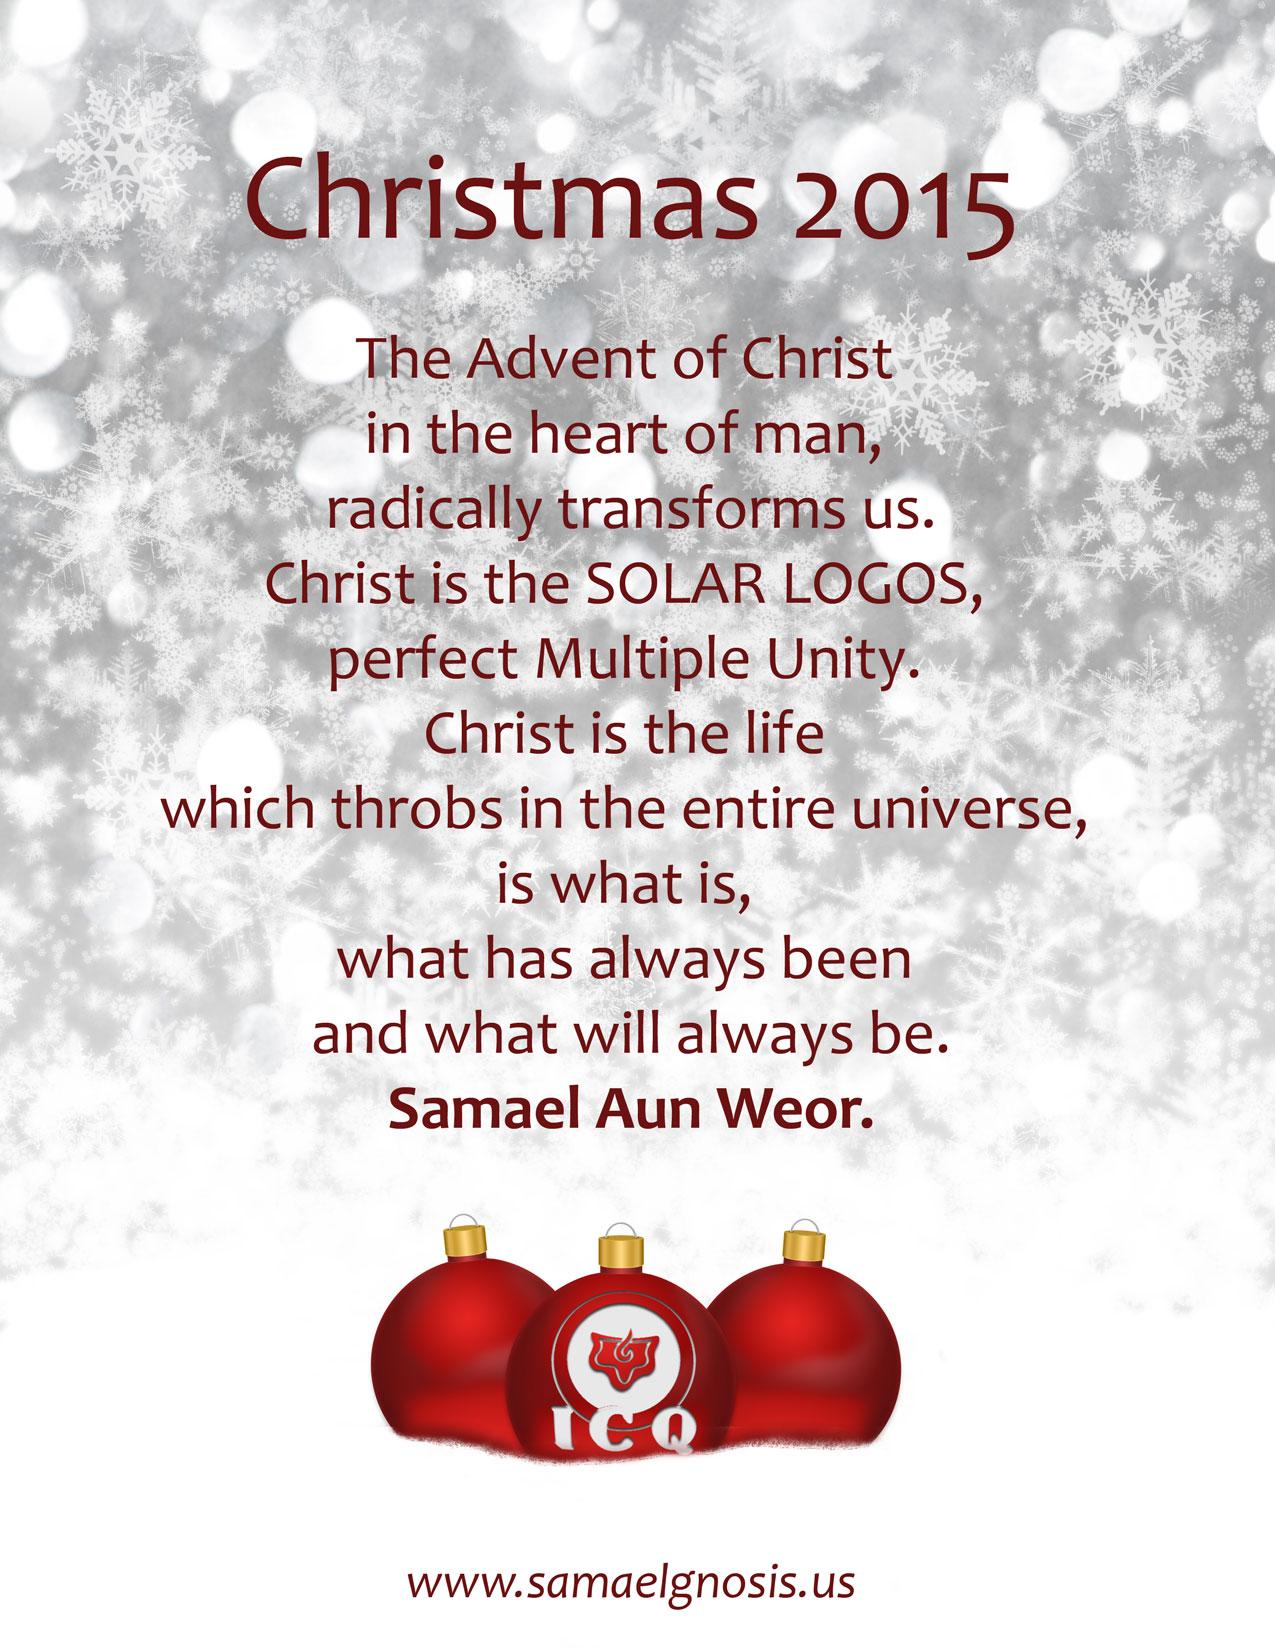 Christmas card samaelgnosis instituto cultural quetzalcoatl 2015 kristyandbryce Gallery